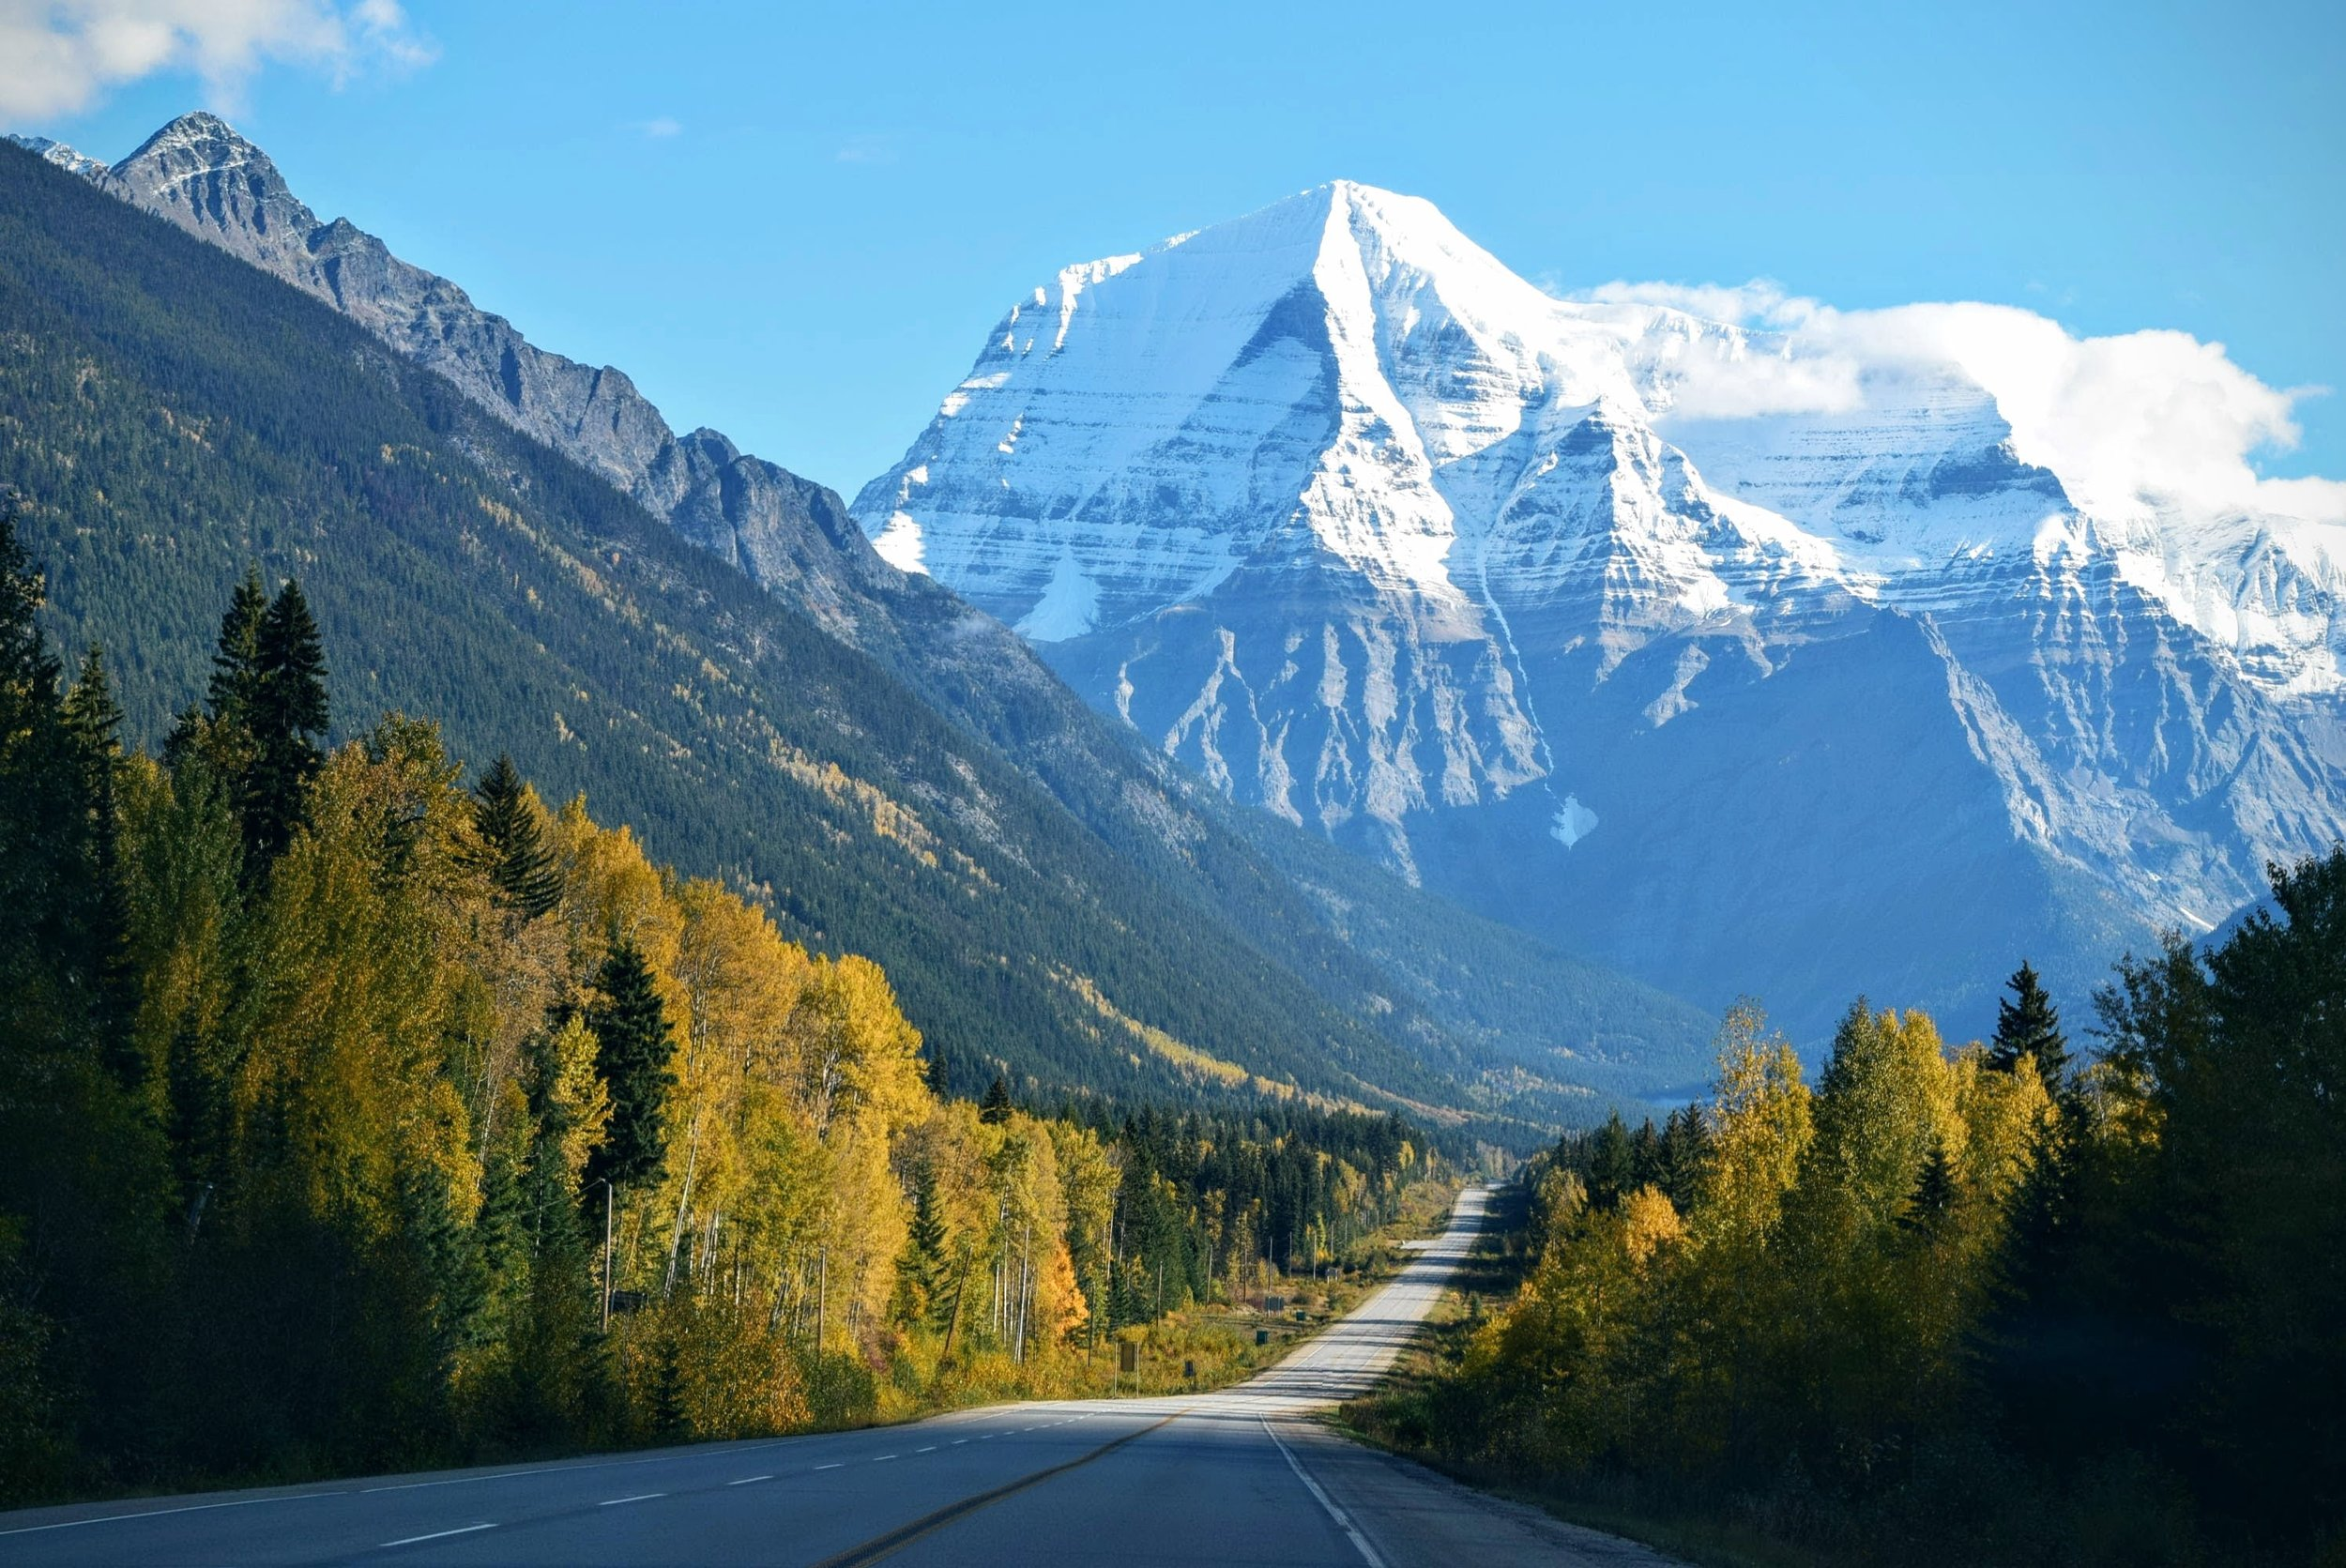 landscape-mountains-nature-67517.jpg